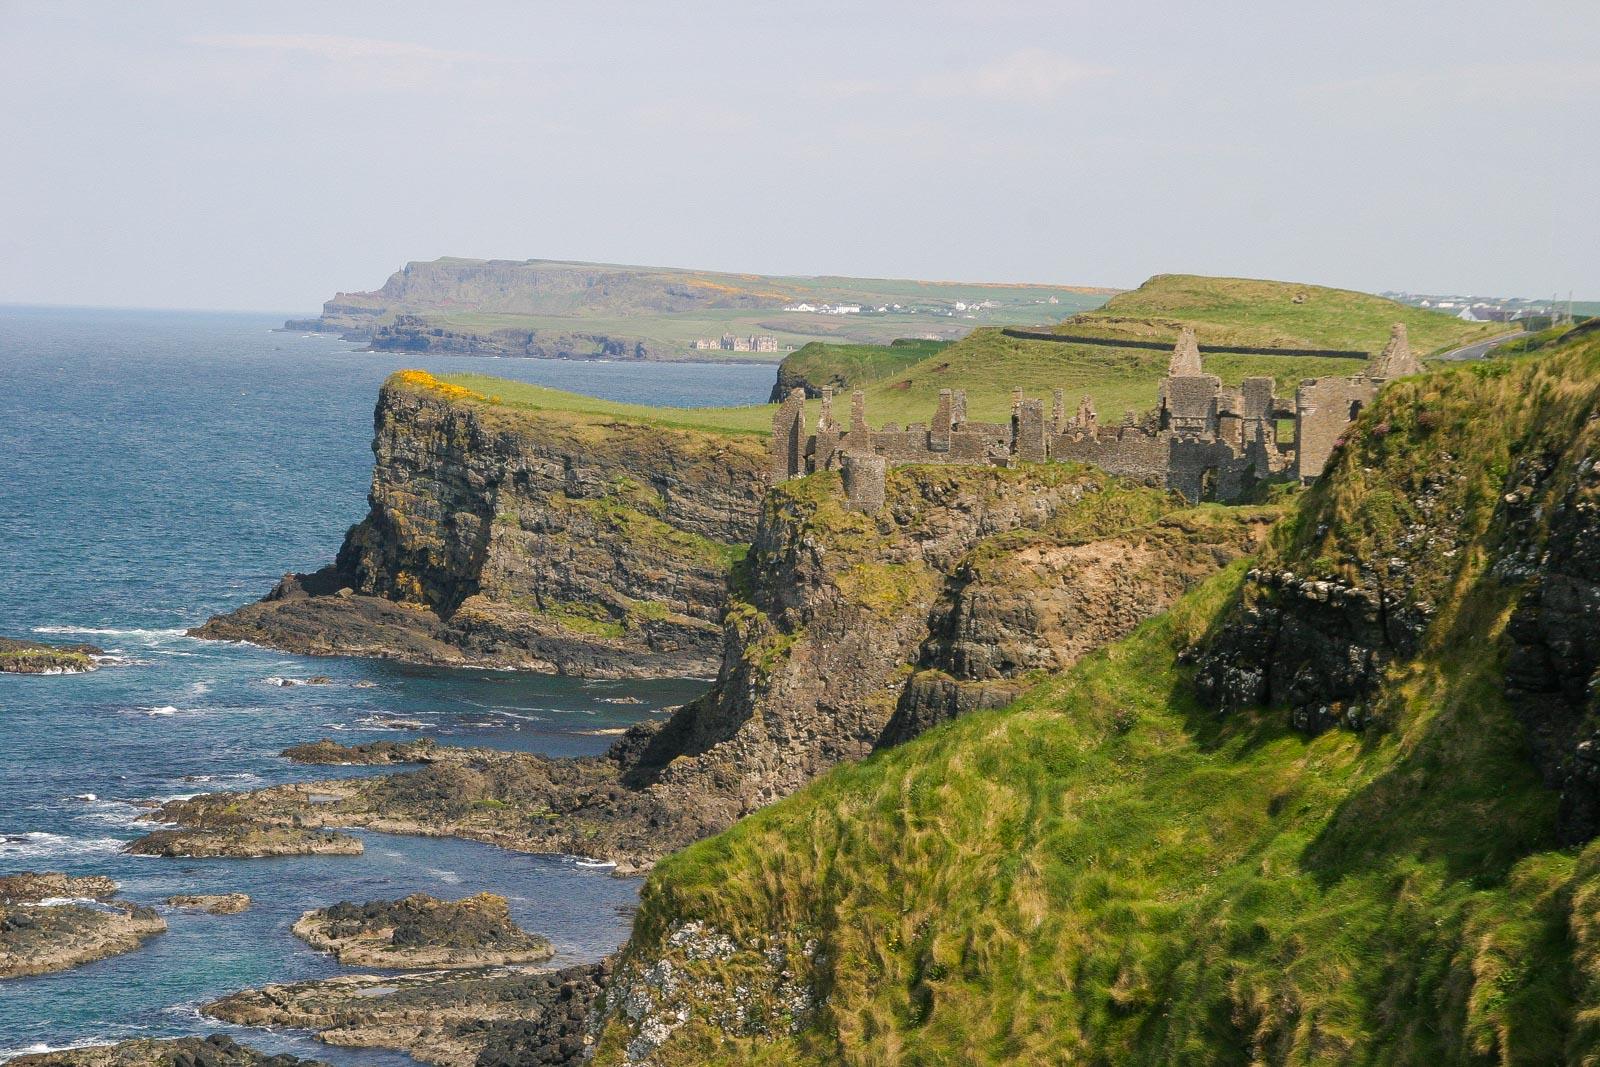 Coast in Northern Ireland, Great Britain.